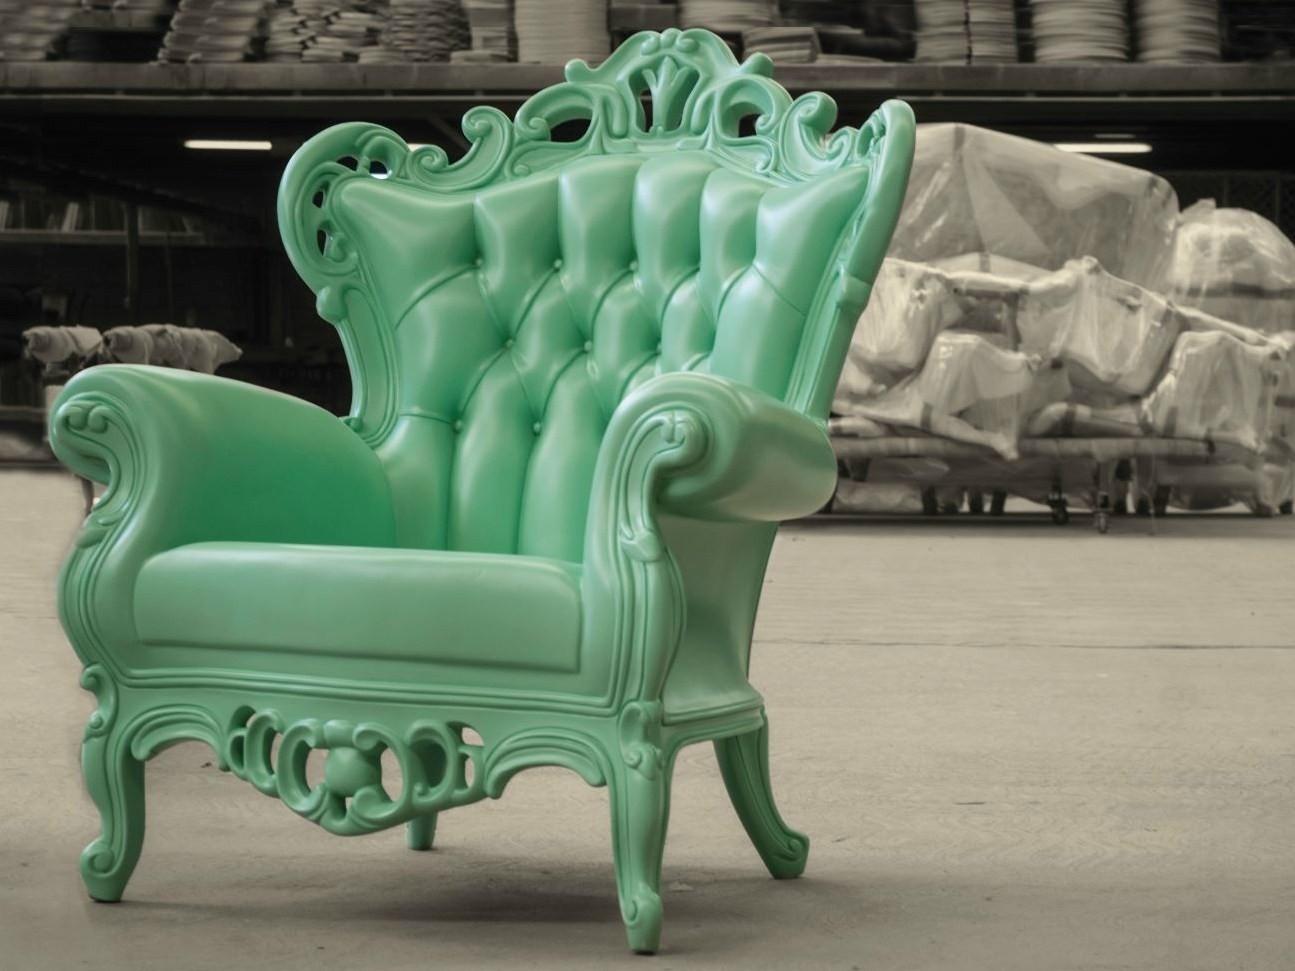 Attirant Outdoor Plastic King Chair